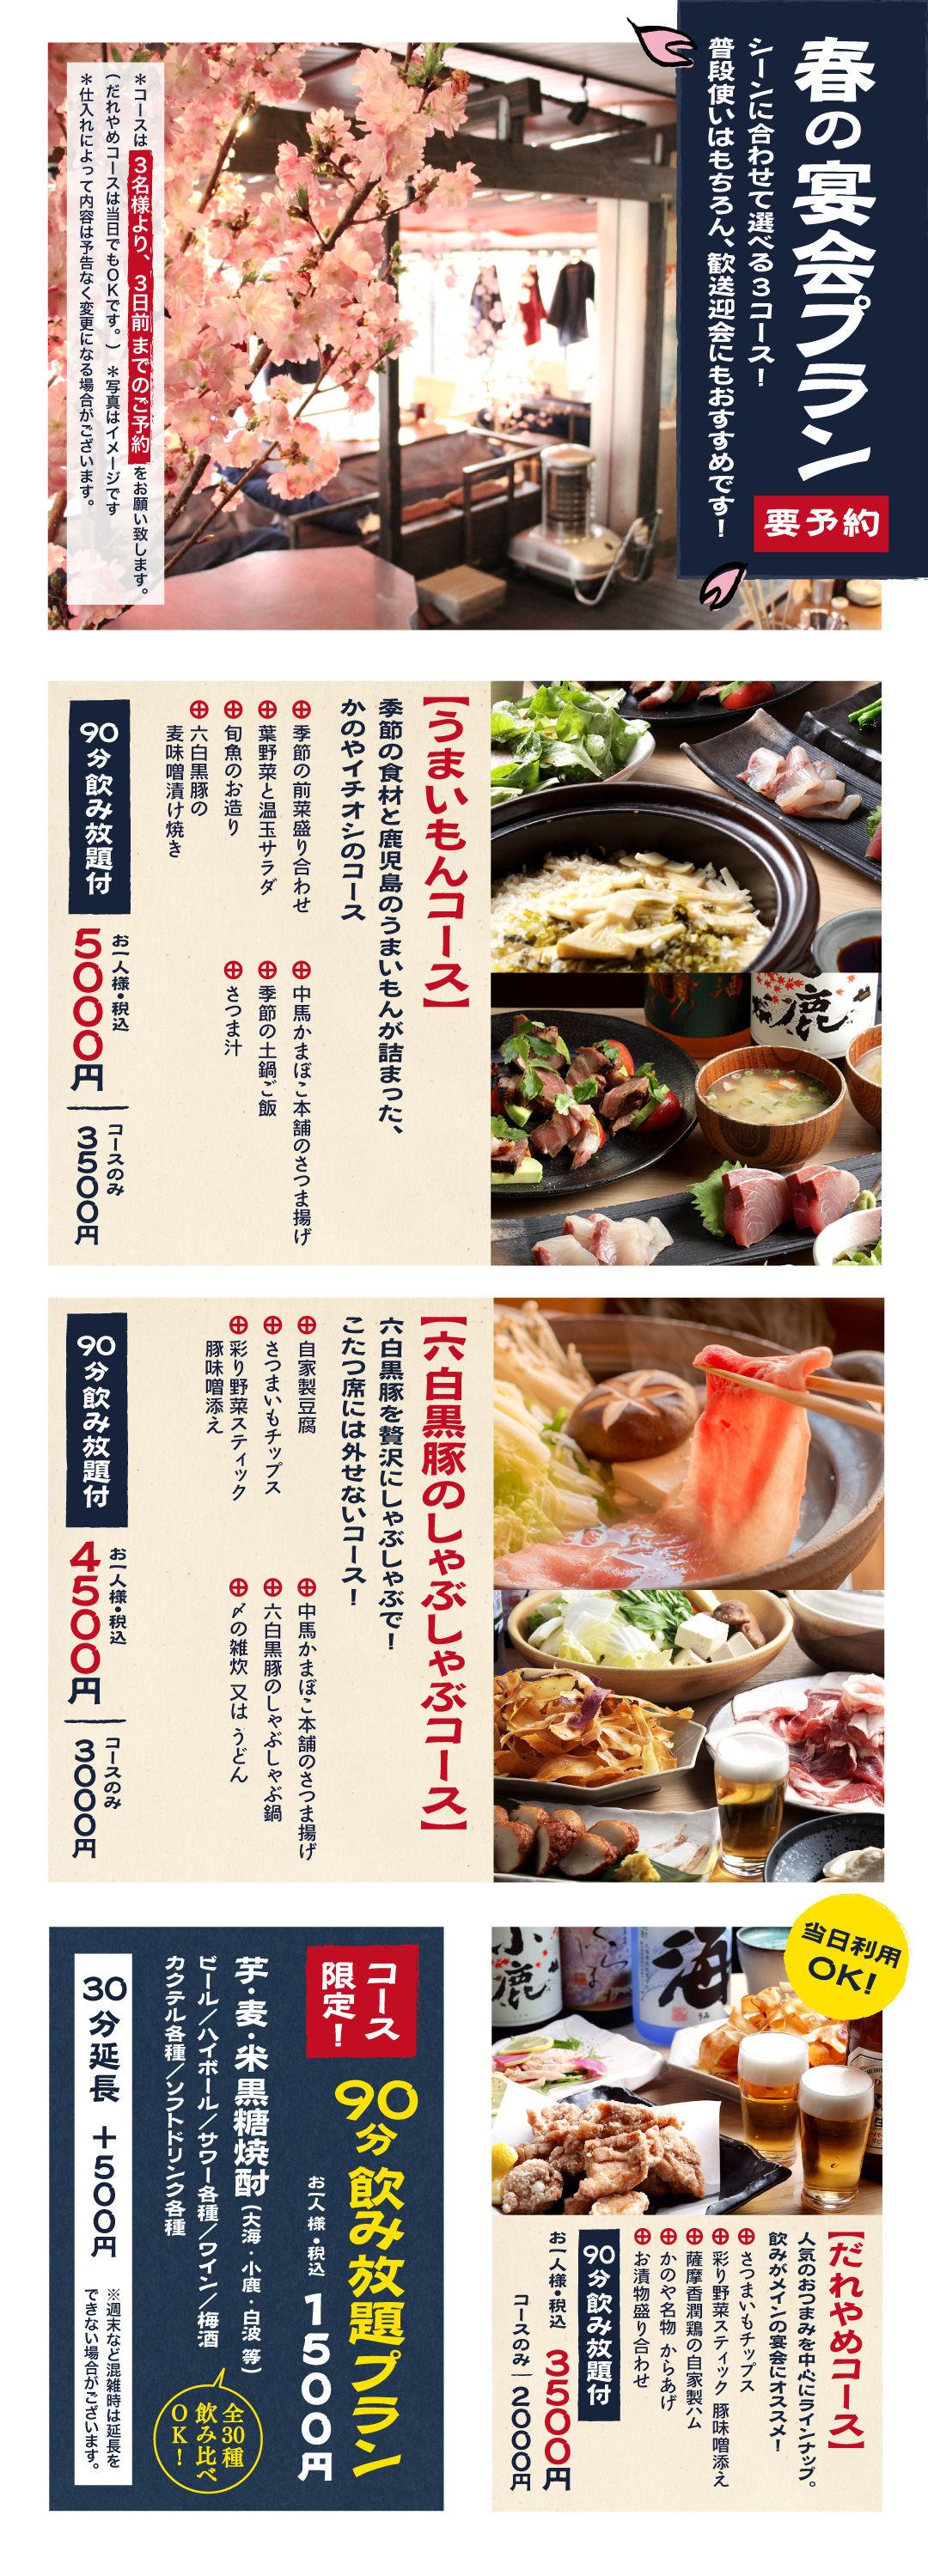 kanoya_1903_enkai.jpg